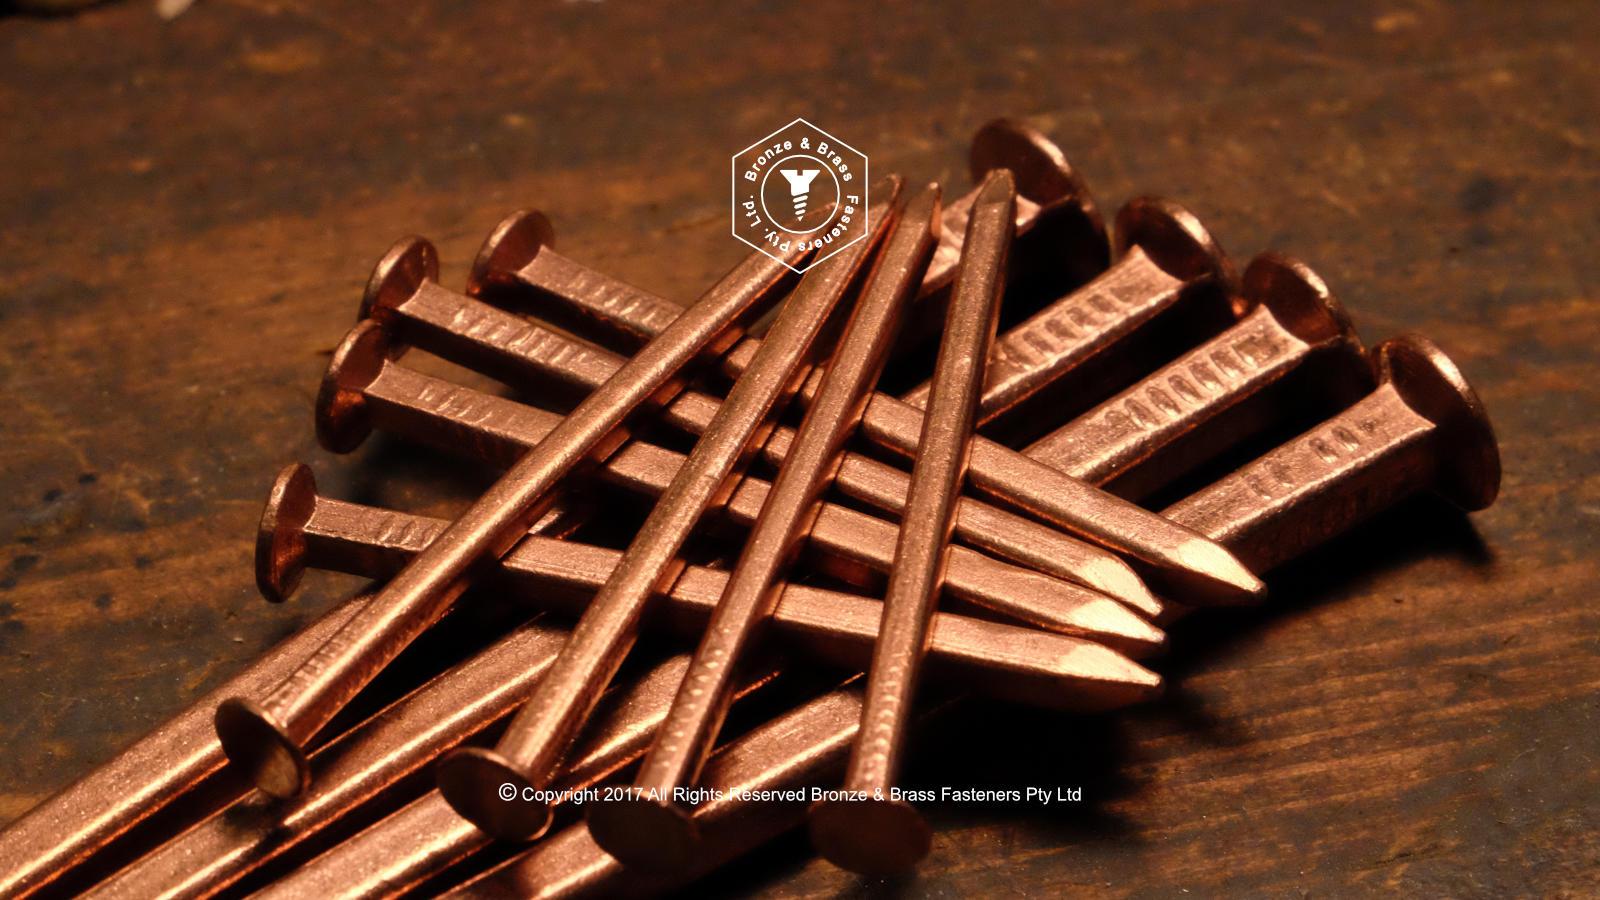 Copper Boat Nails